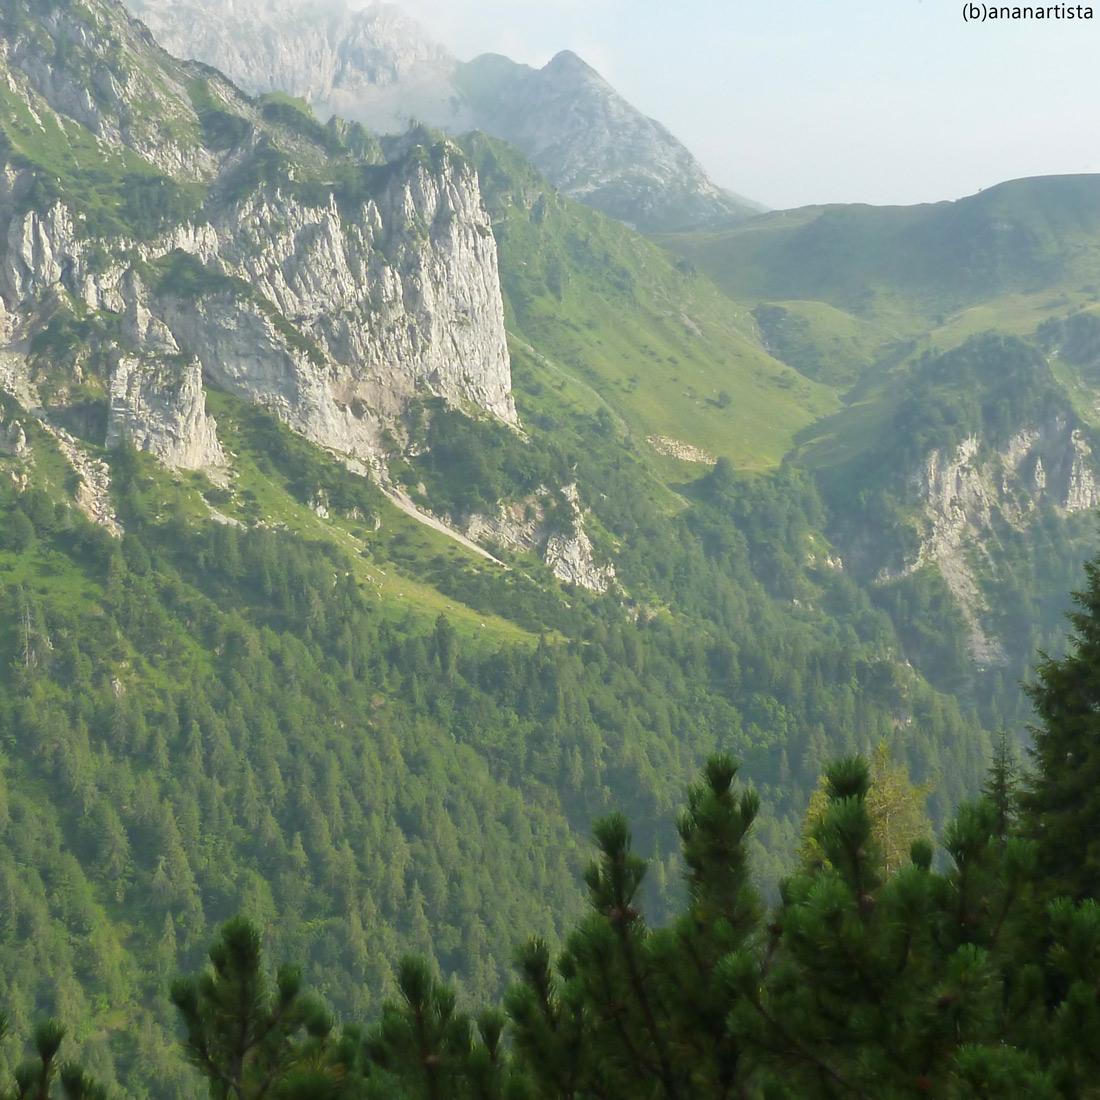 Landschaft: landscape in the alps by (b)ananartista sbuff